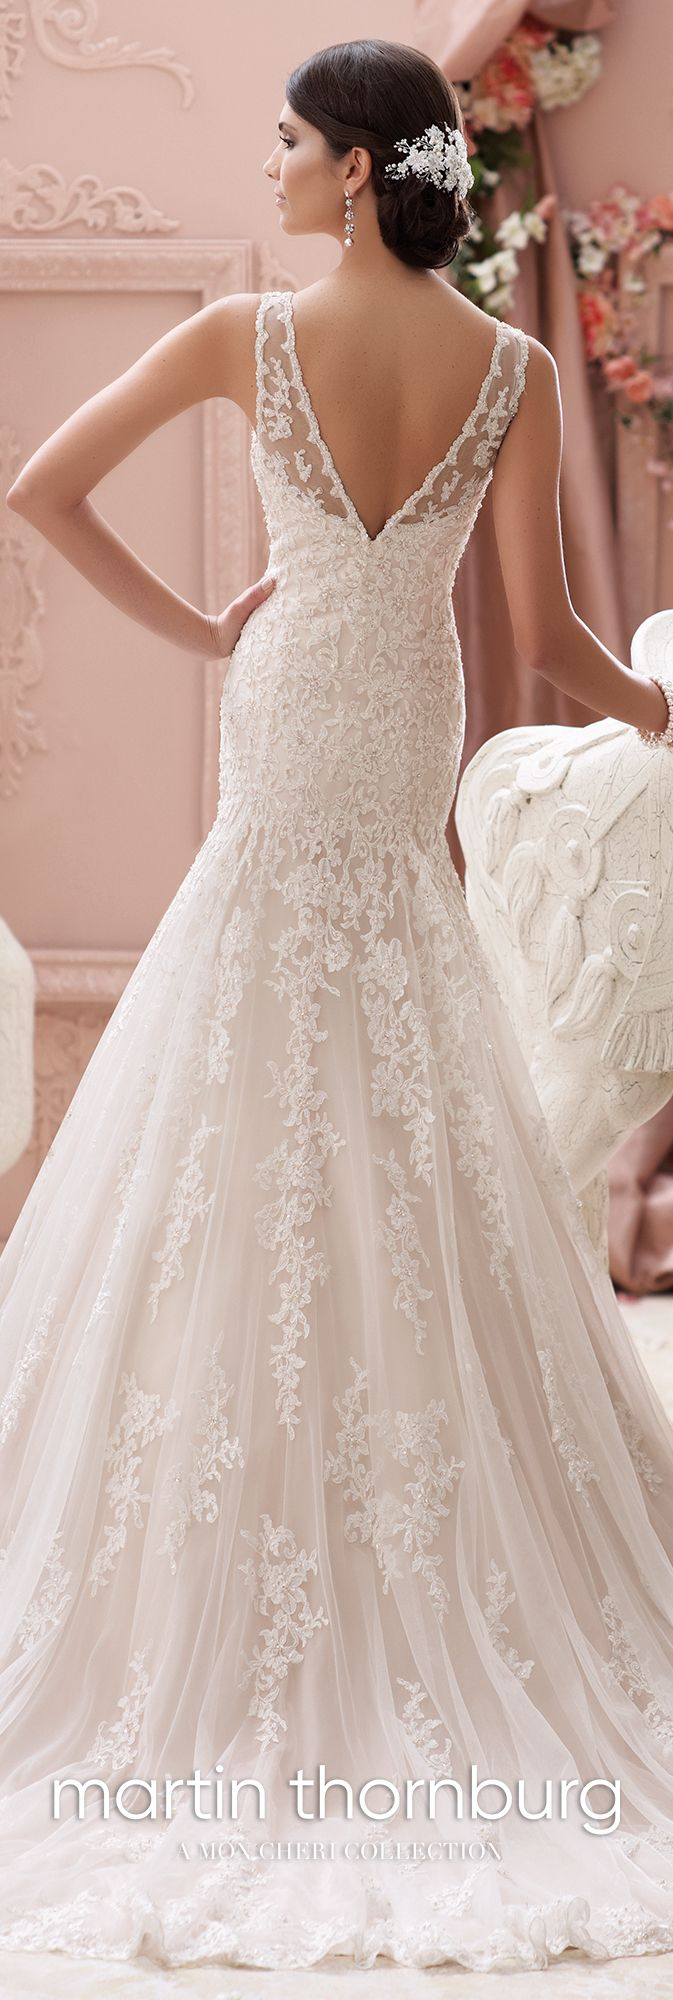 Unique wedding dresses fall martin thornburg wedding dress